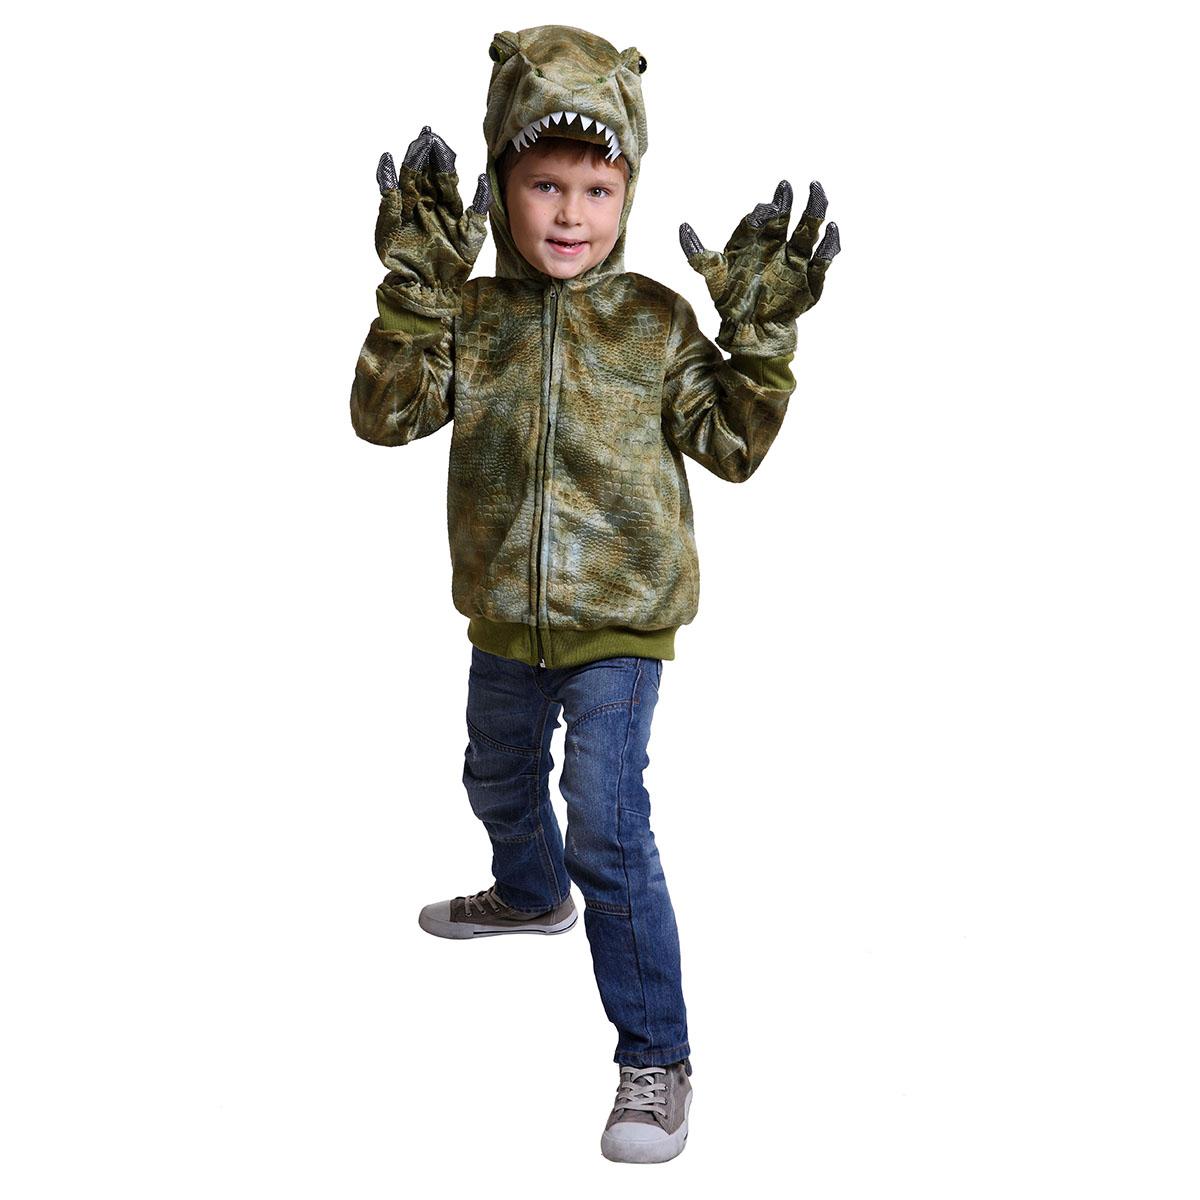 tyrannosaurus rex costume for girls and boys - dragon halloween costume